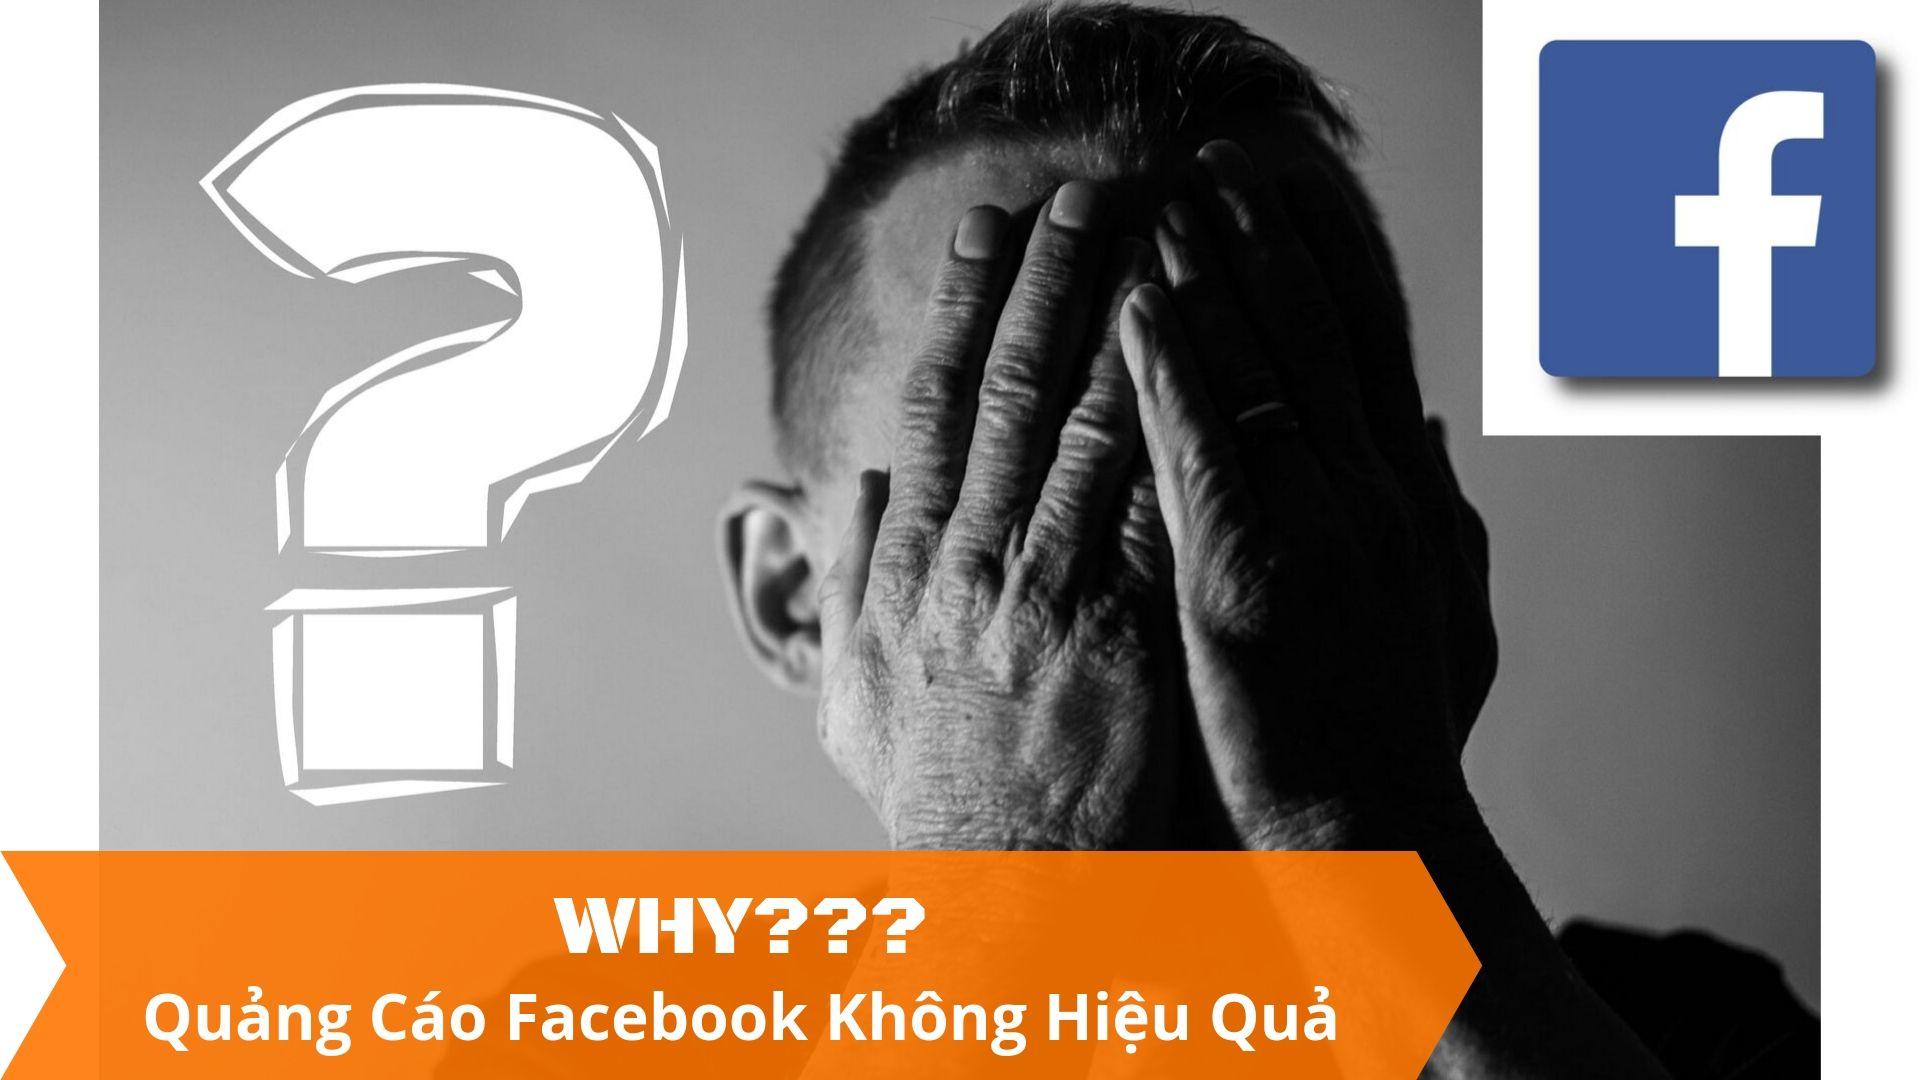 Tại Sao Quảng Cáo Facebook Không Hiệu Quả? - Estore Education